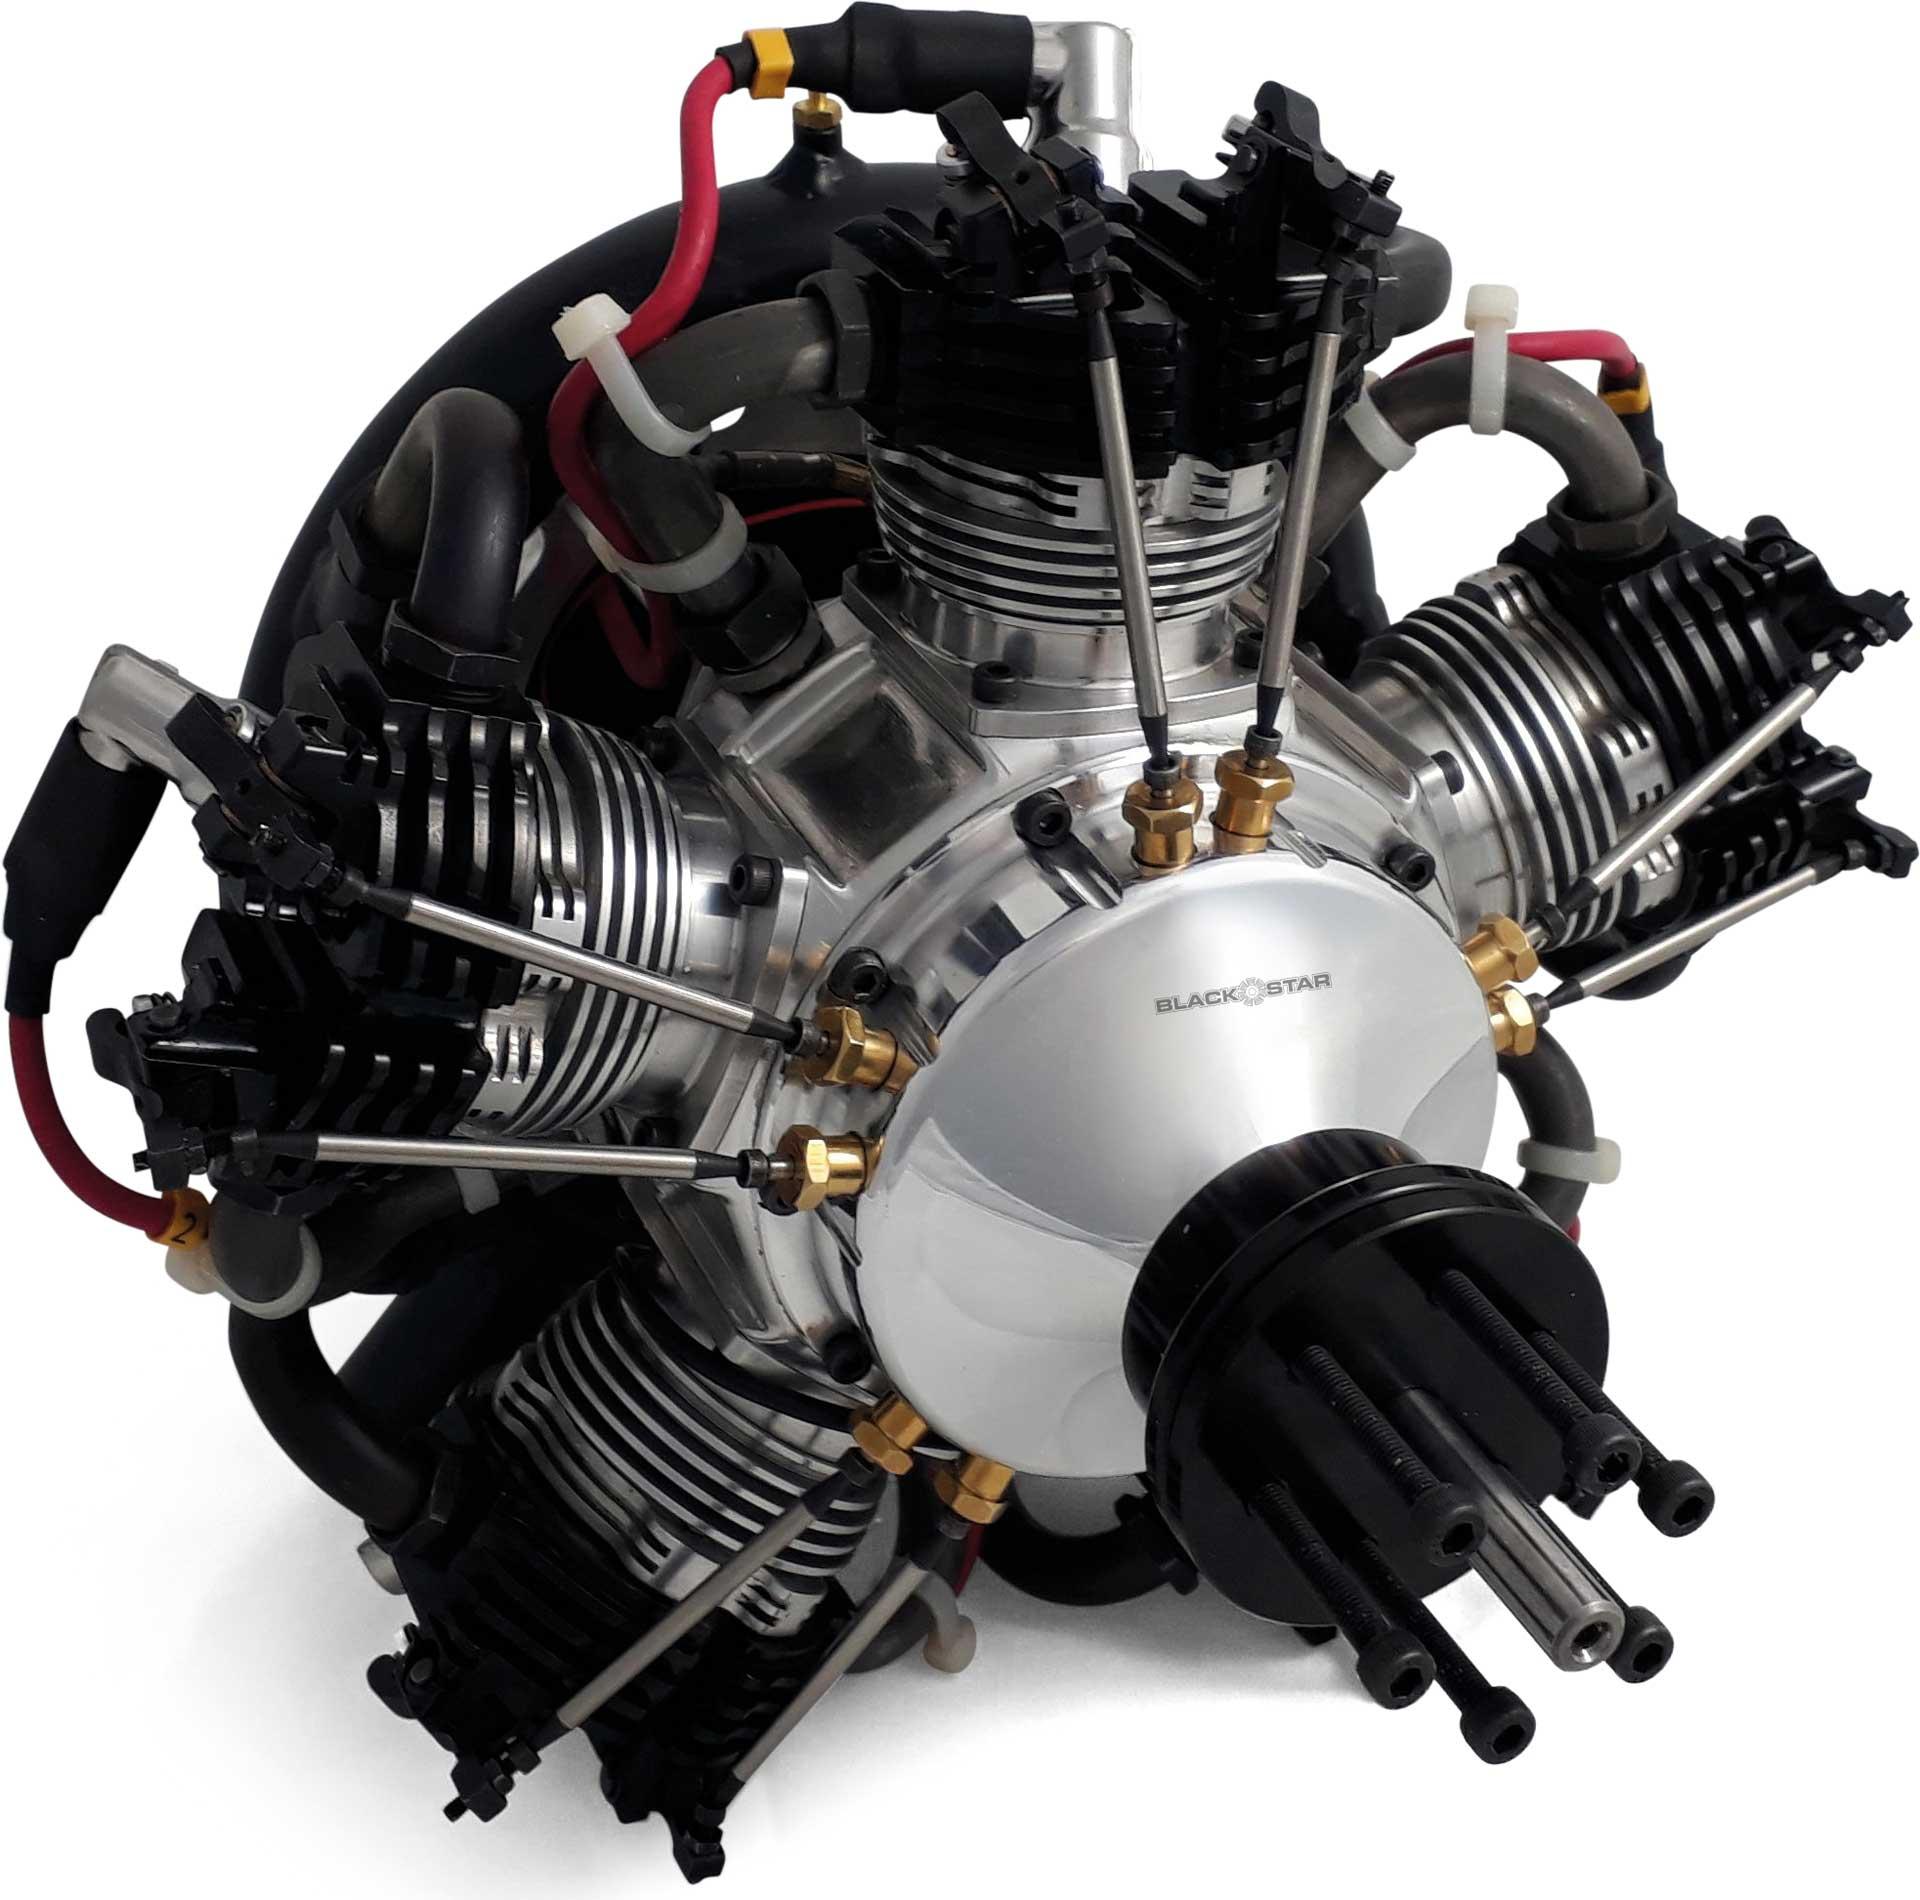 UMS Tomahawk Black Star 5-250 V4 Sternmotor